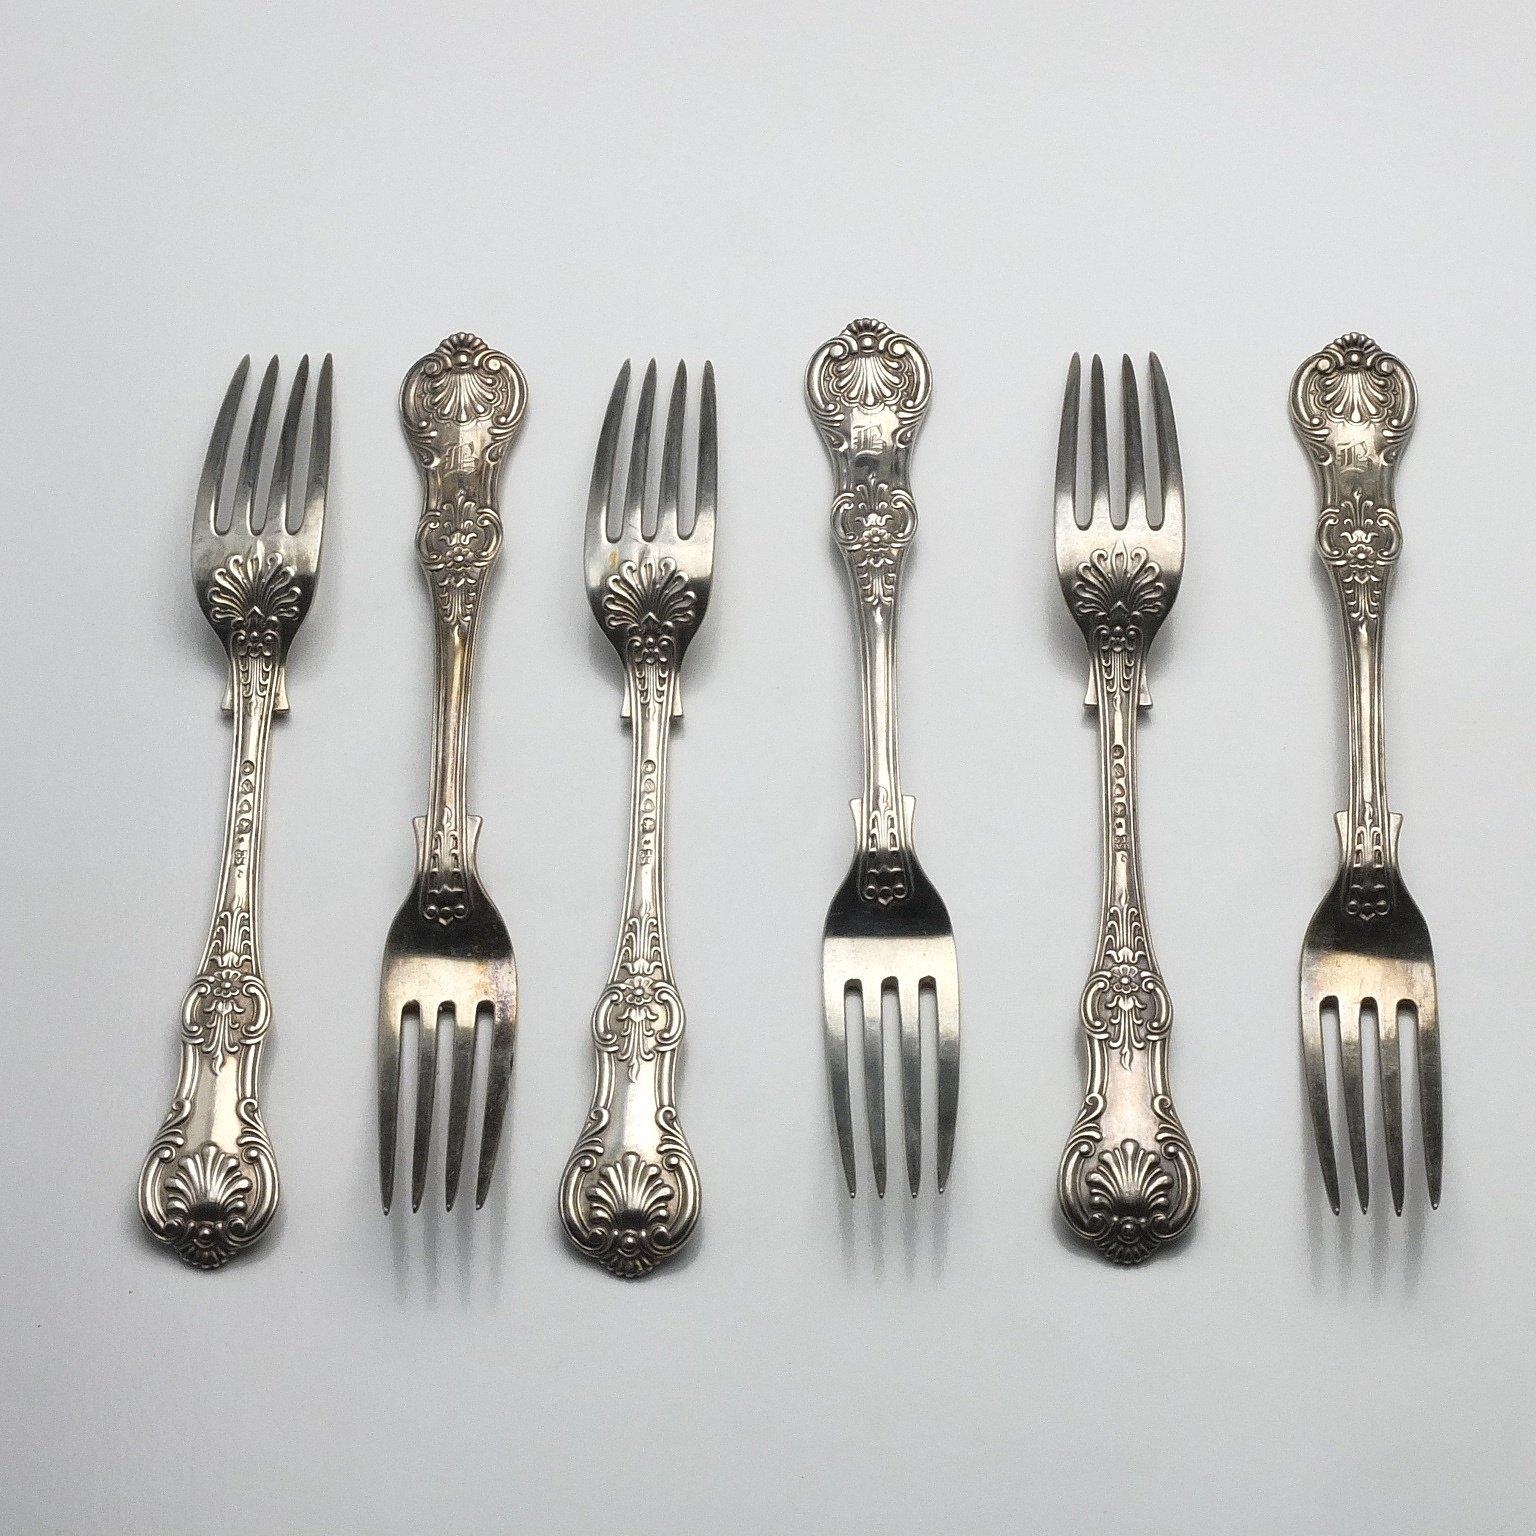 'Six Victorian Monogrammed Sterling Silver Kings Pattern Entree Forks John Aldwinckle & Thomas Slater London 1888'